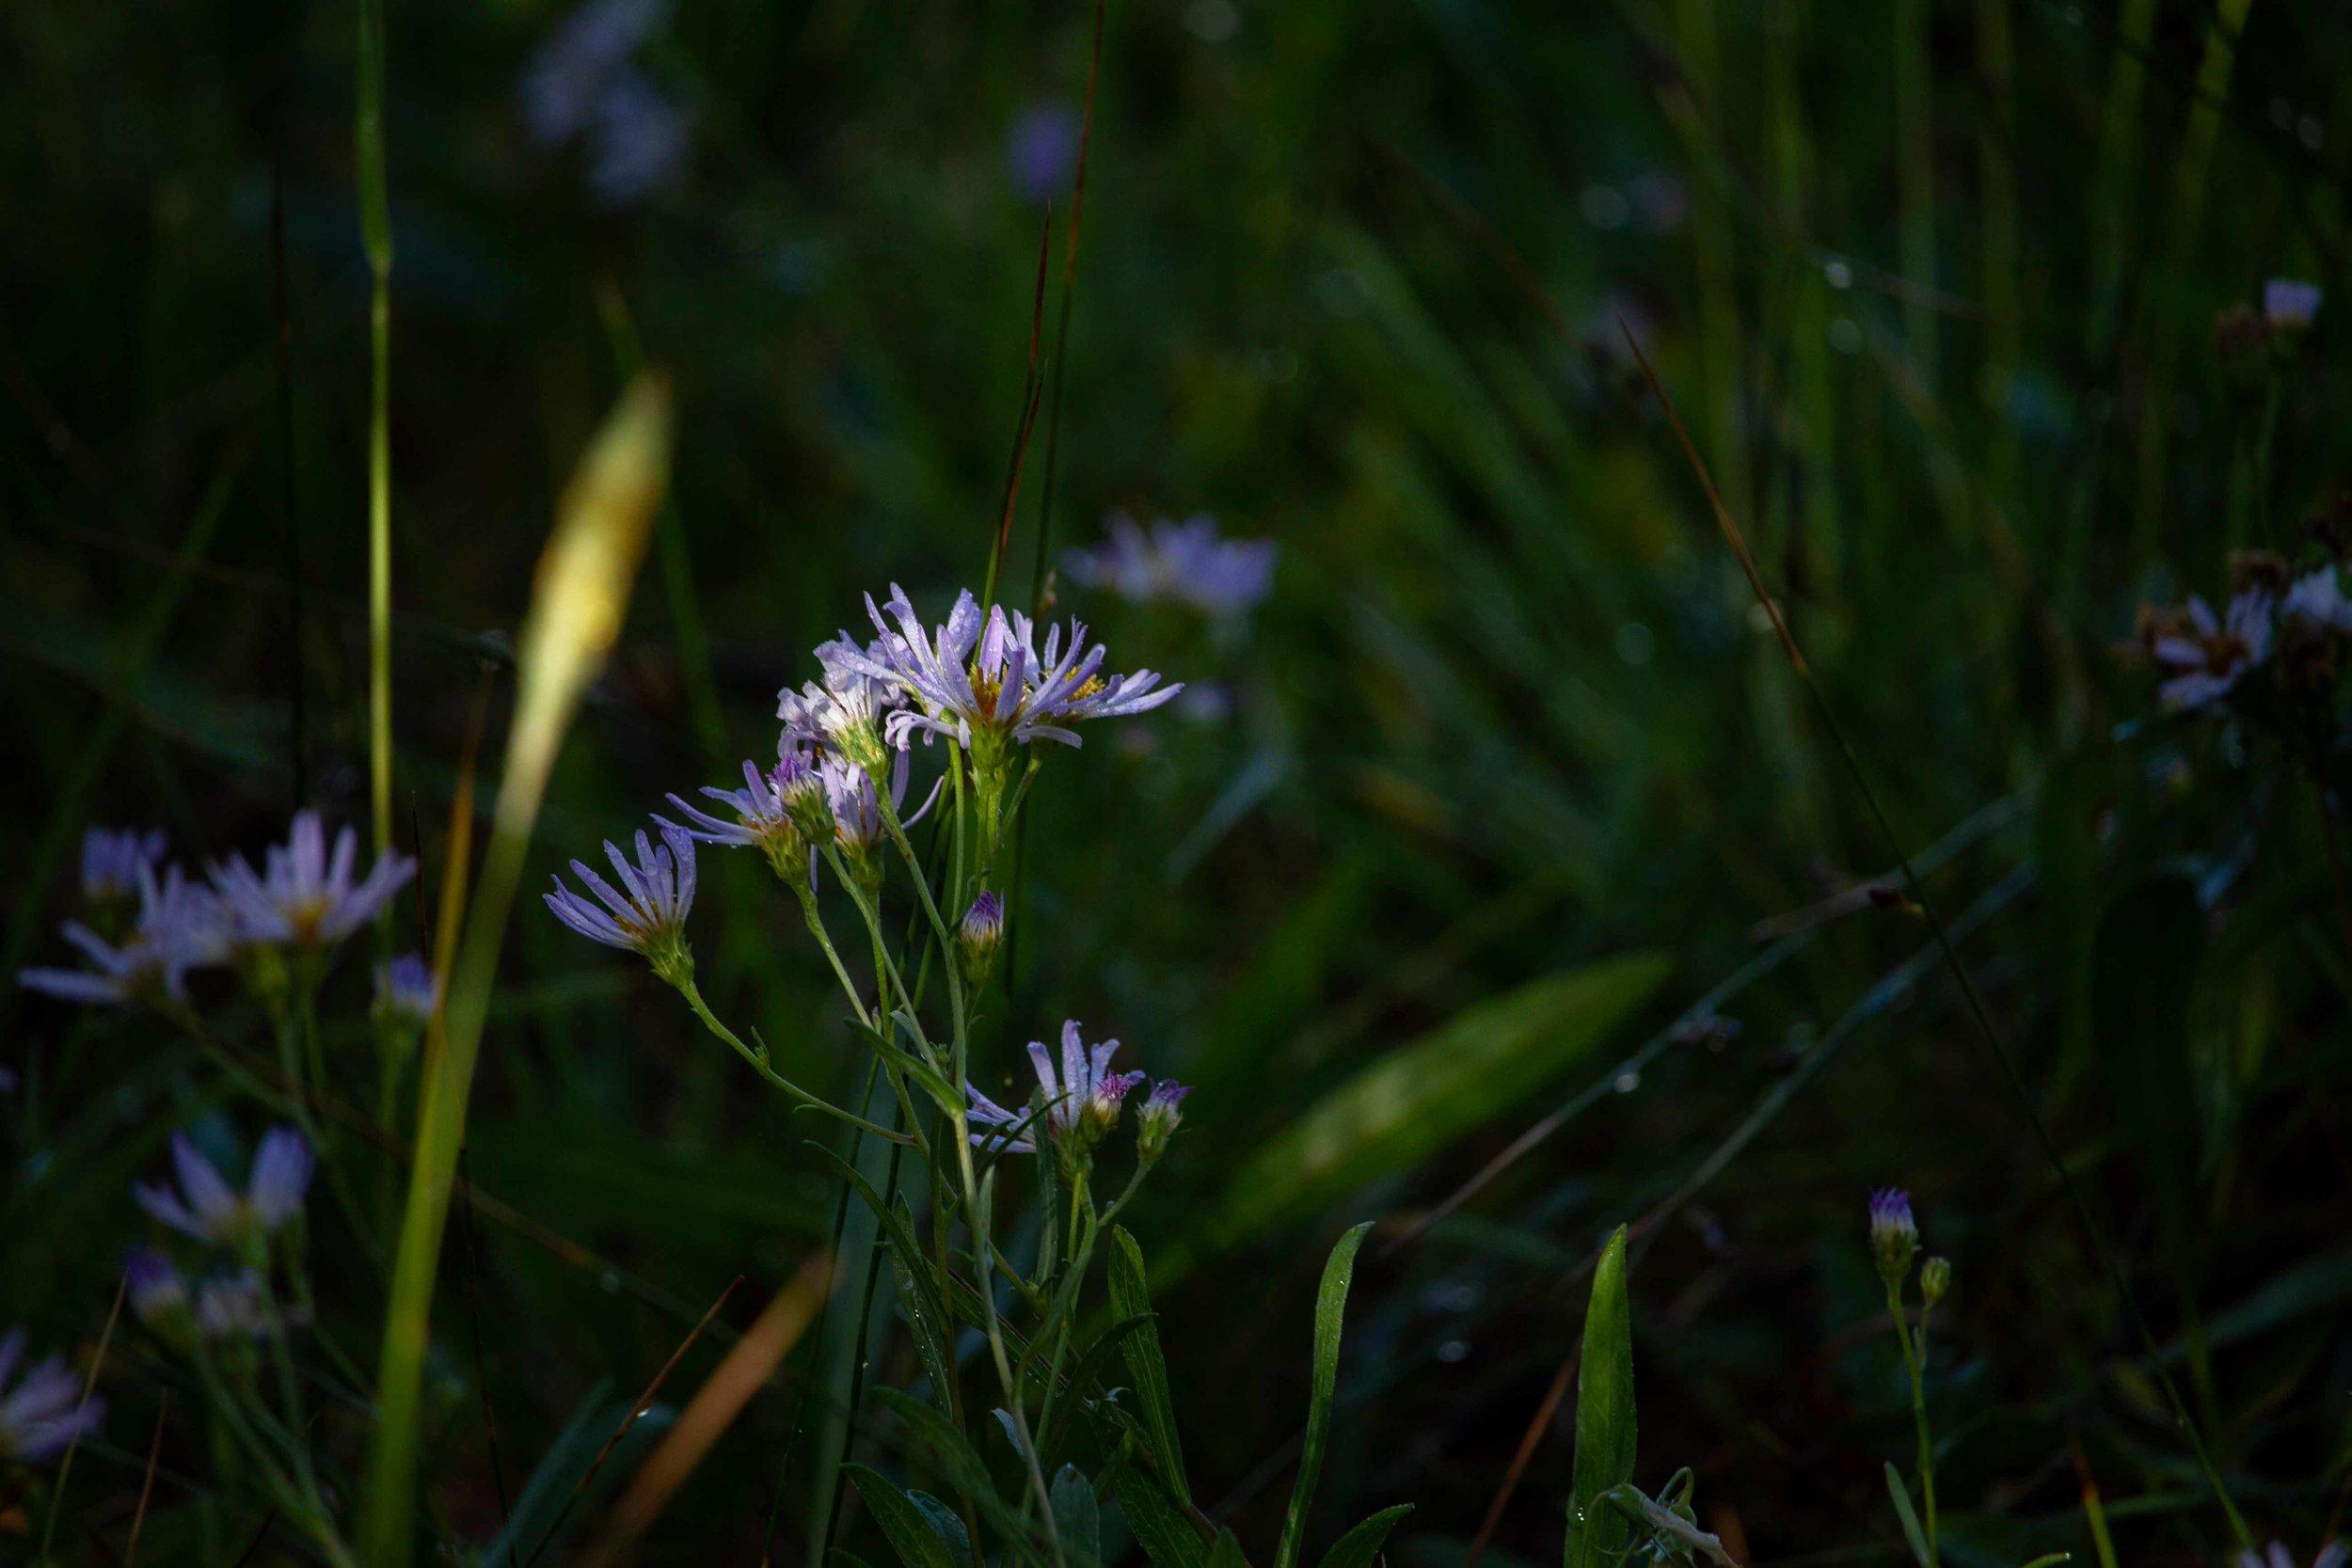 Wildflowers in the Upper Geyser Basin near Old Faithful.